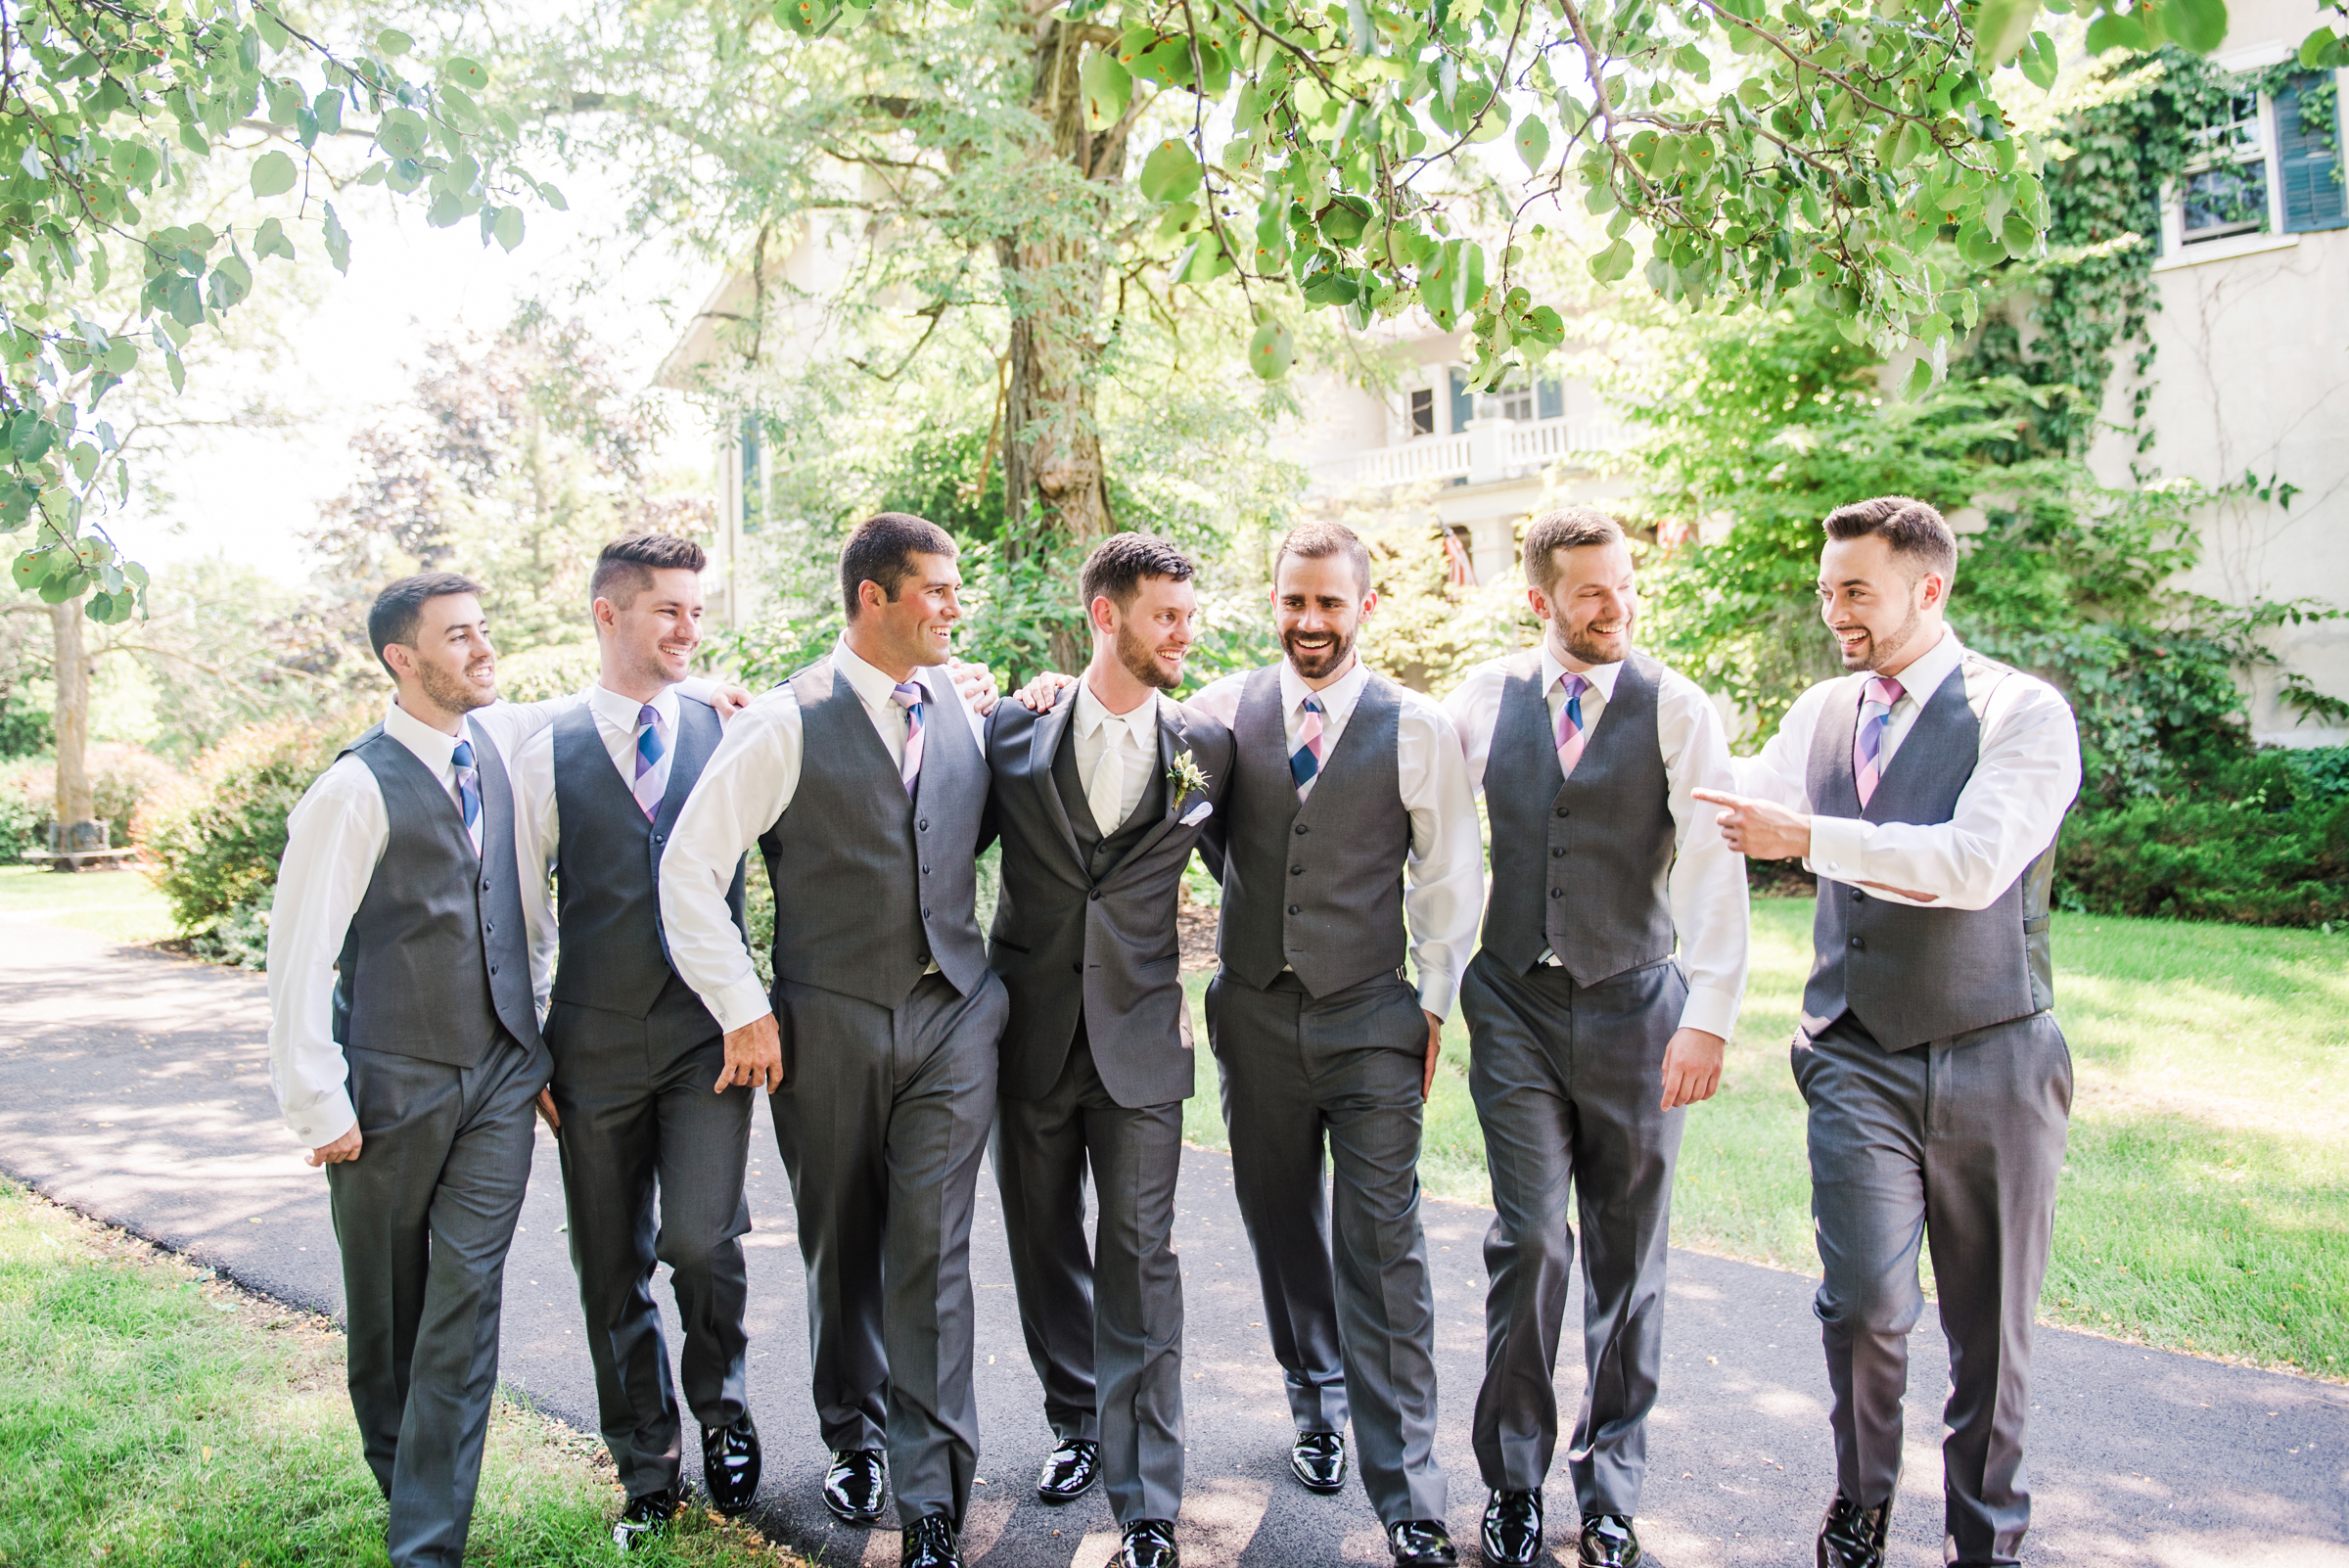 Jerris_Wadsworth_Wedding_Barn_Rochester_Wedding_JILL_STUDIO_Rochester_NY_Photographer_DSC_2333.jpg